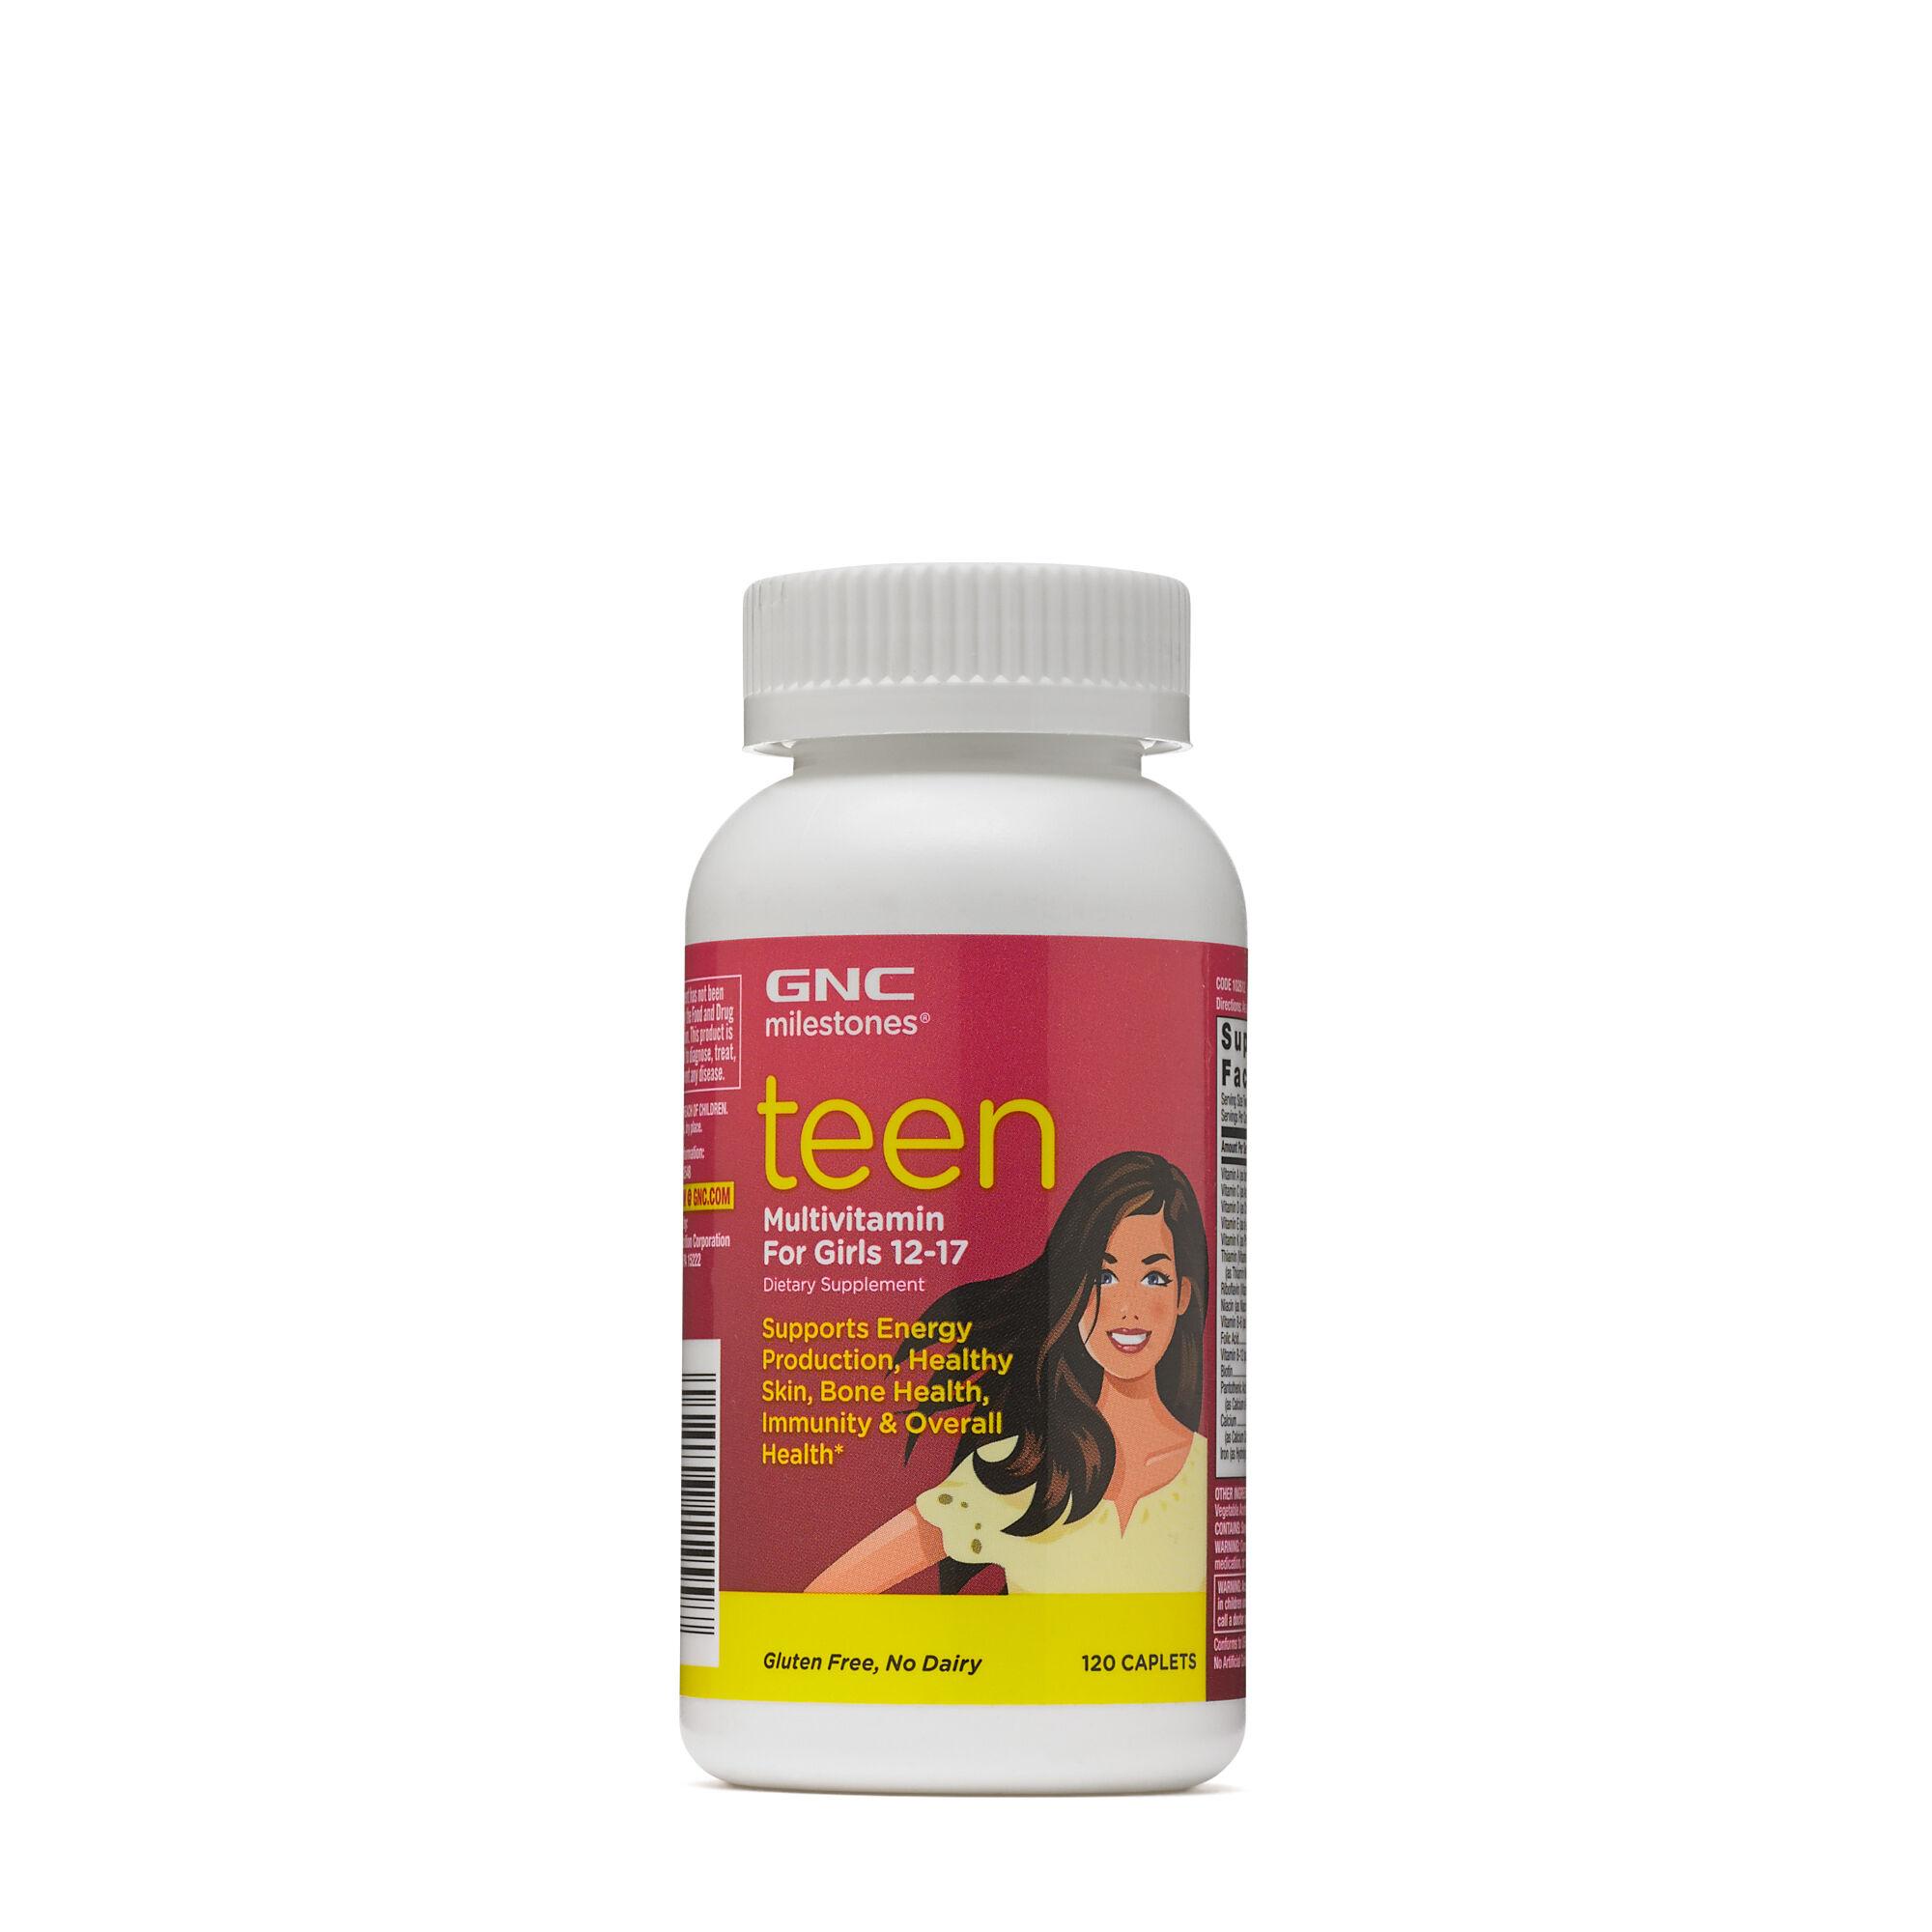 Gnc Milestones Teen Multivitamin For Girls 12 17 Gnc